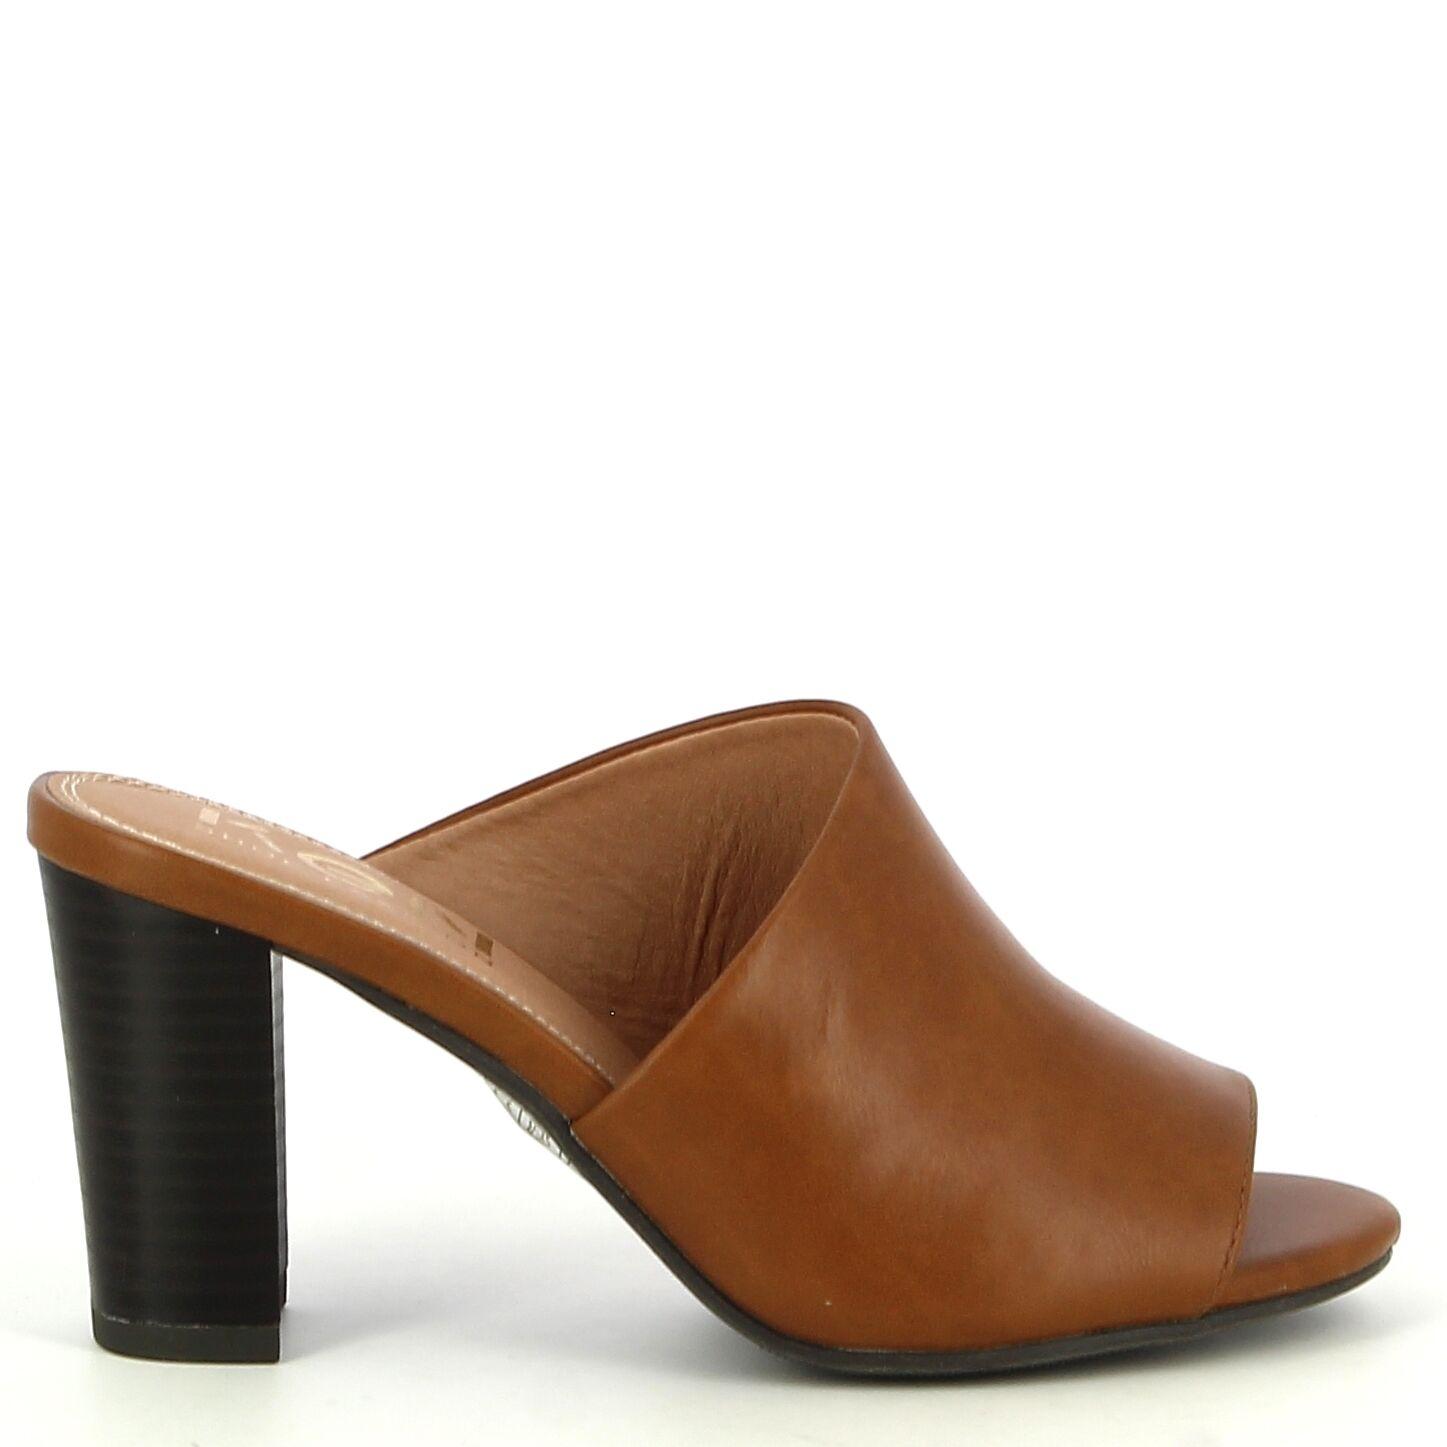 Ken Shoe Fashion - Chaussures Slip-On - Camel